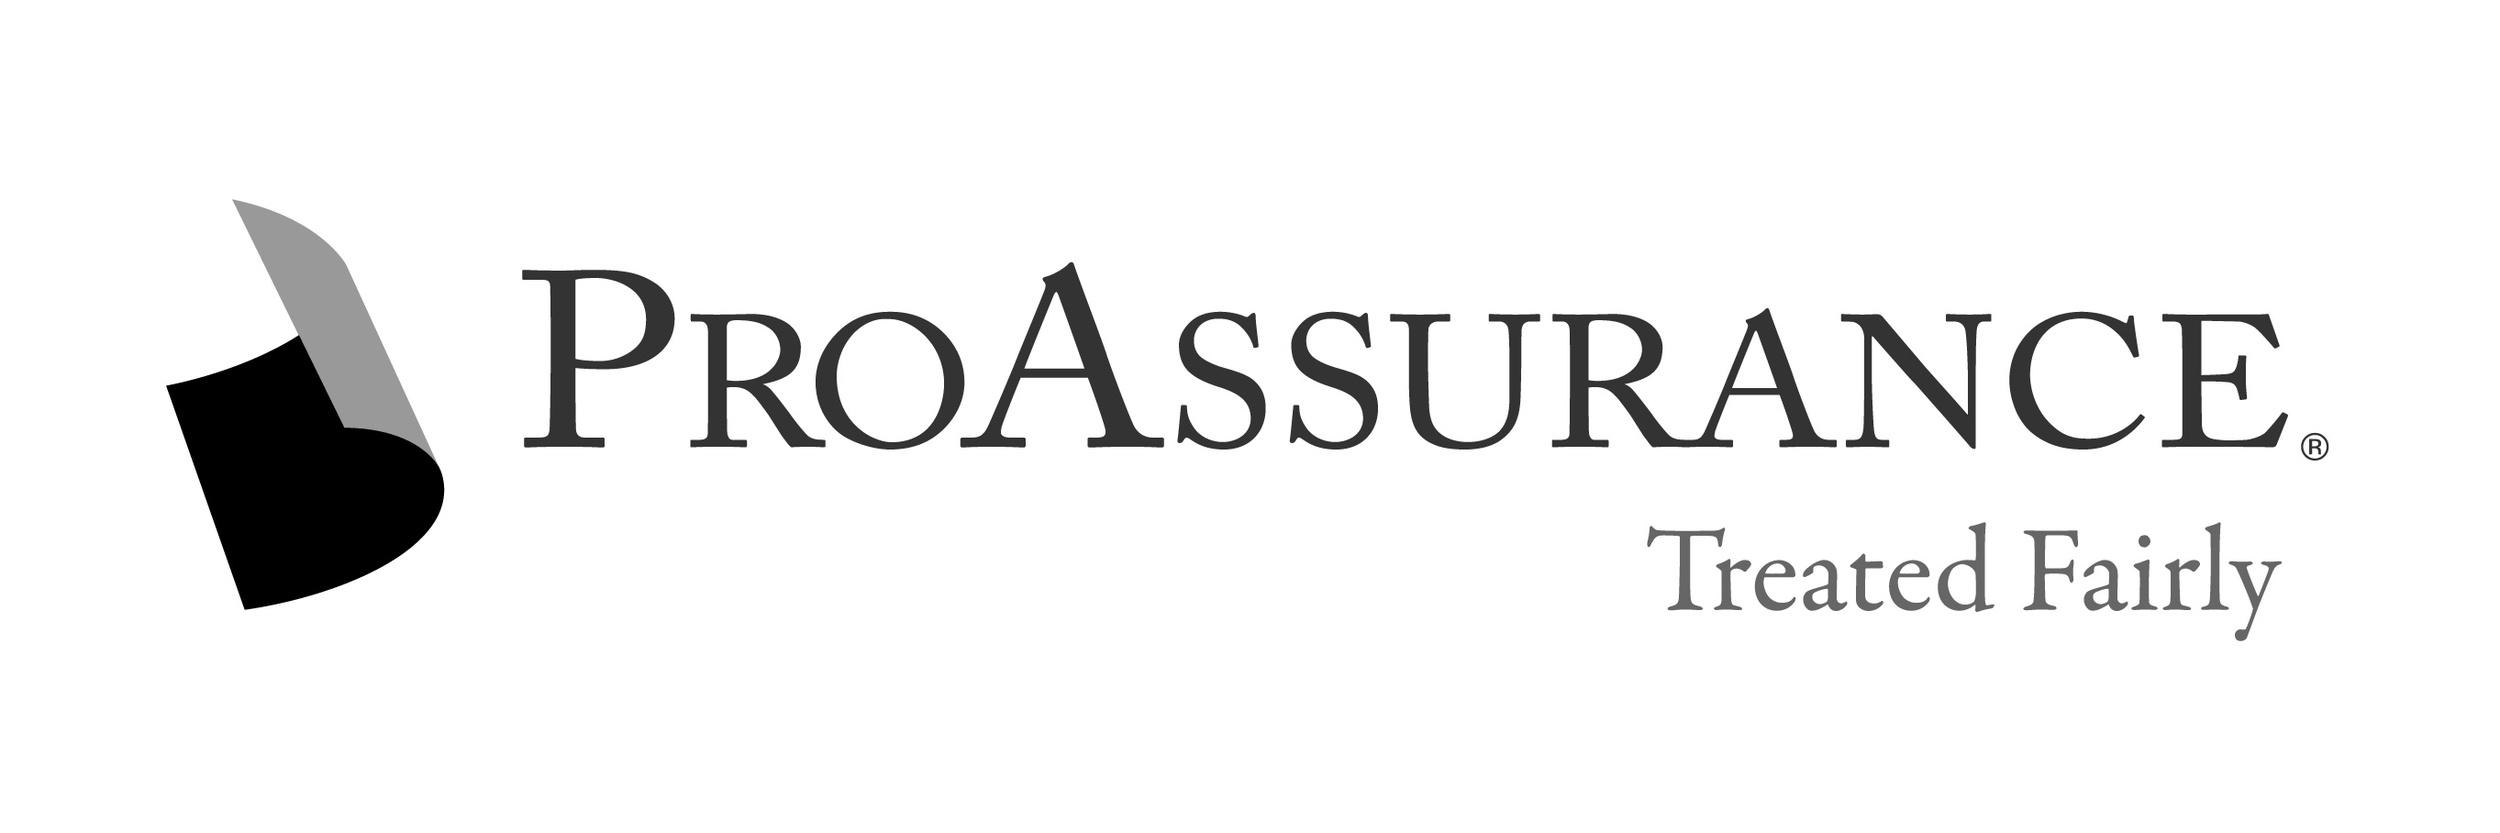 PRA Greyscale Logo.jpg